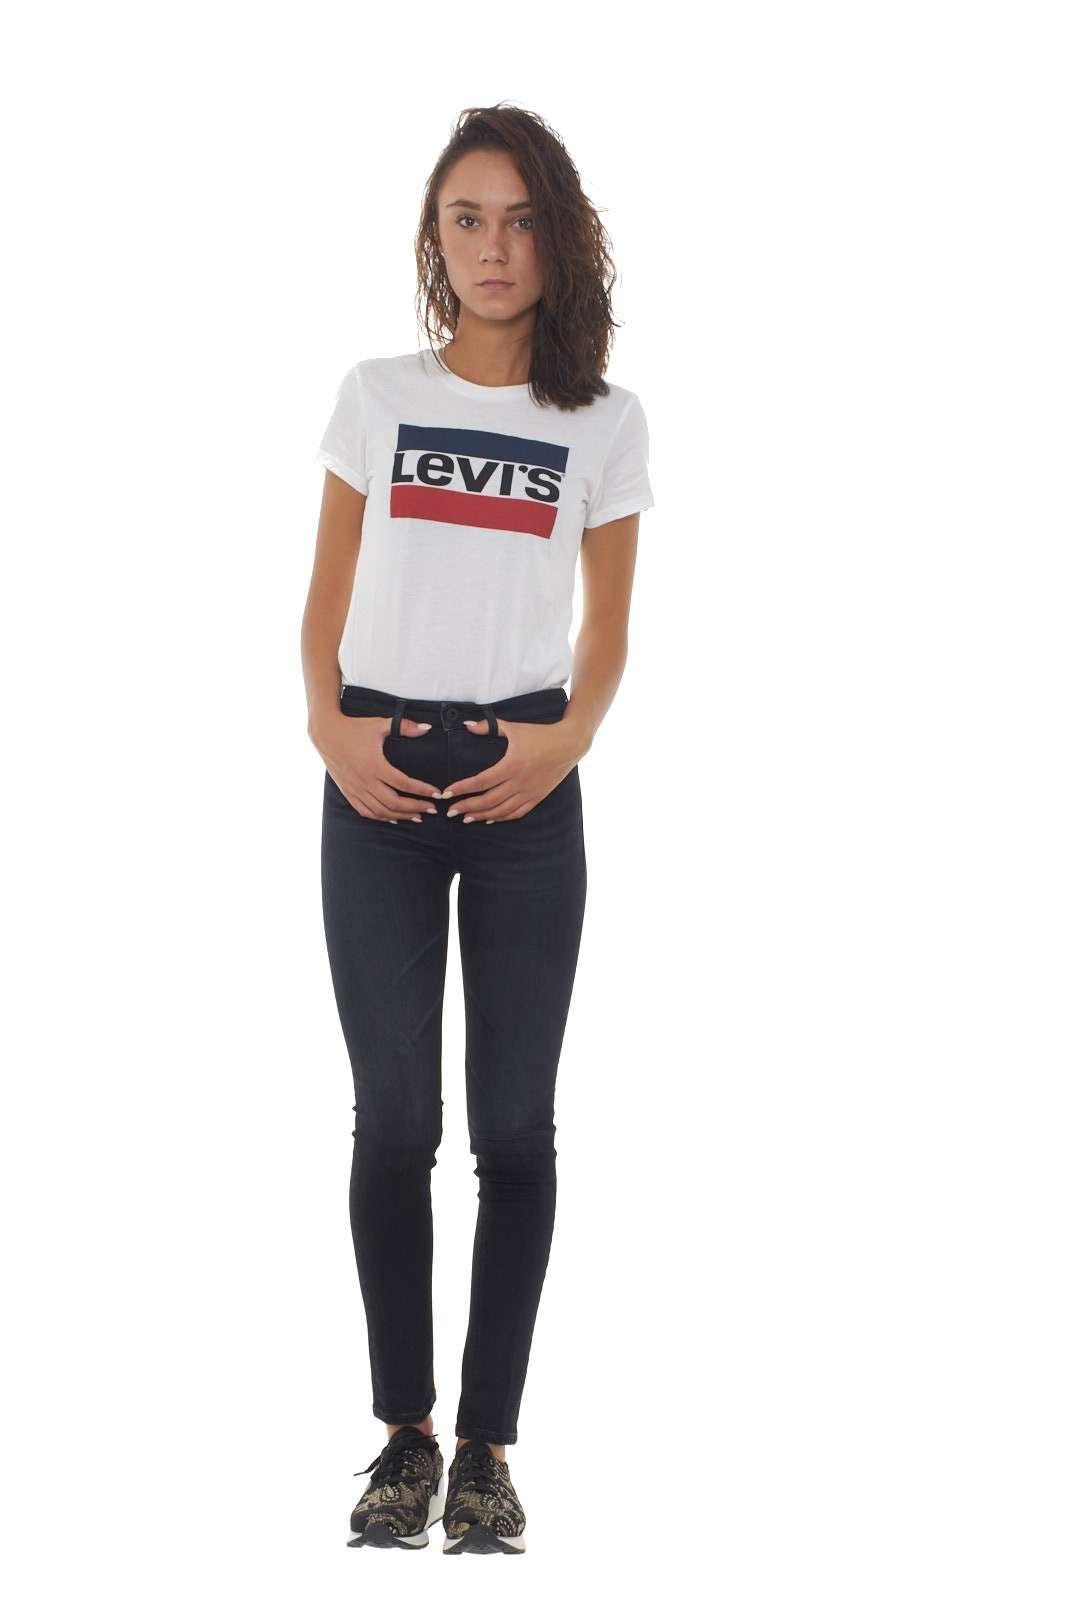 https://www.parmax.com/media/catalog/product/a/i/AI-outlet_parmax-t-shirt-donna-Levis-17369%200297-D_2.jpg